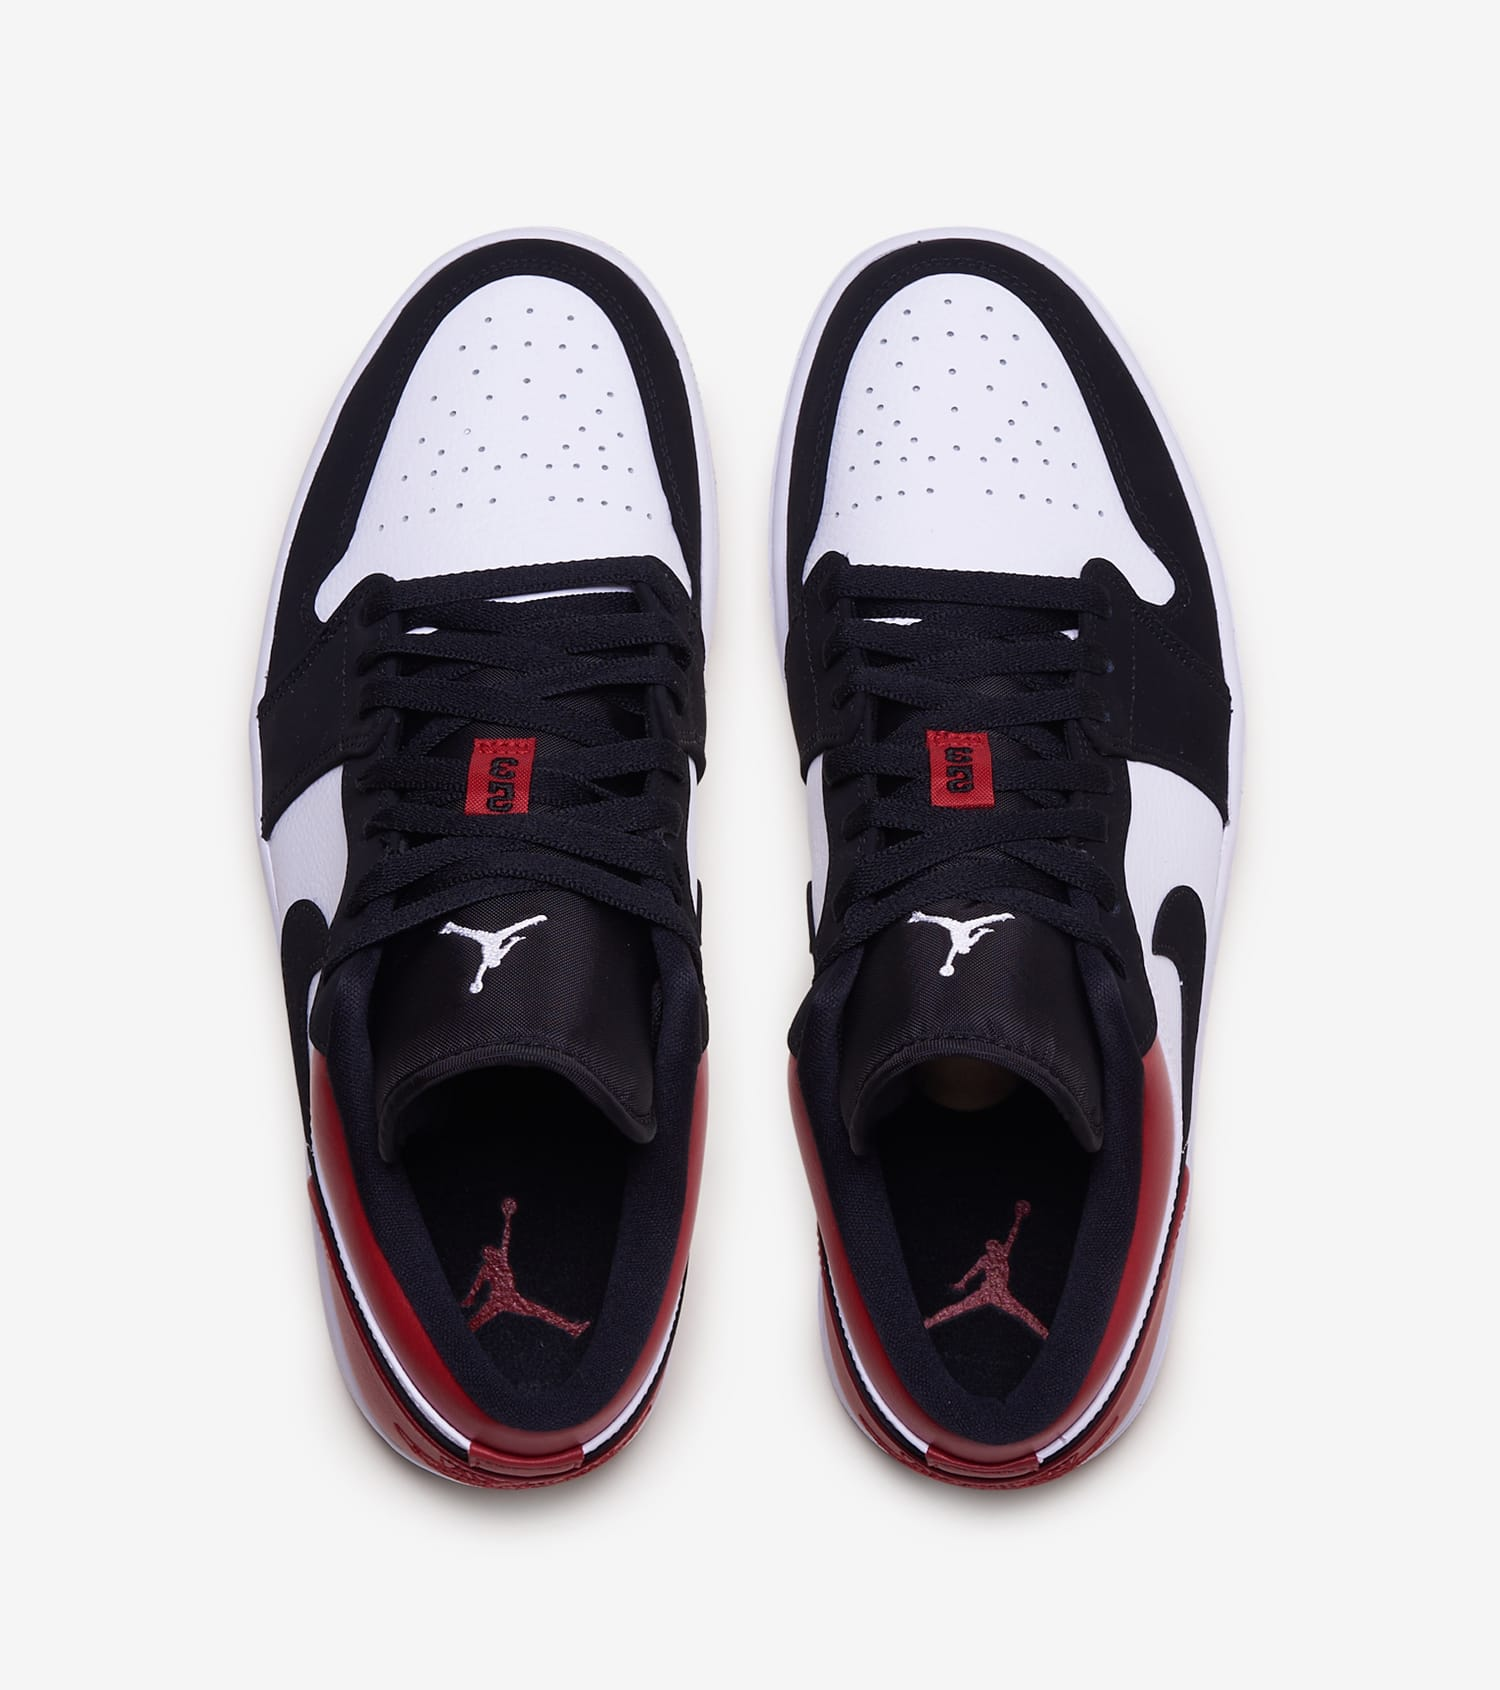 wholesale dealer 4f14a 84726 Air Jordan 1 Low Black Toe